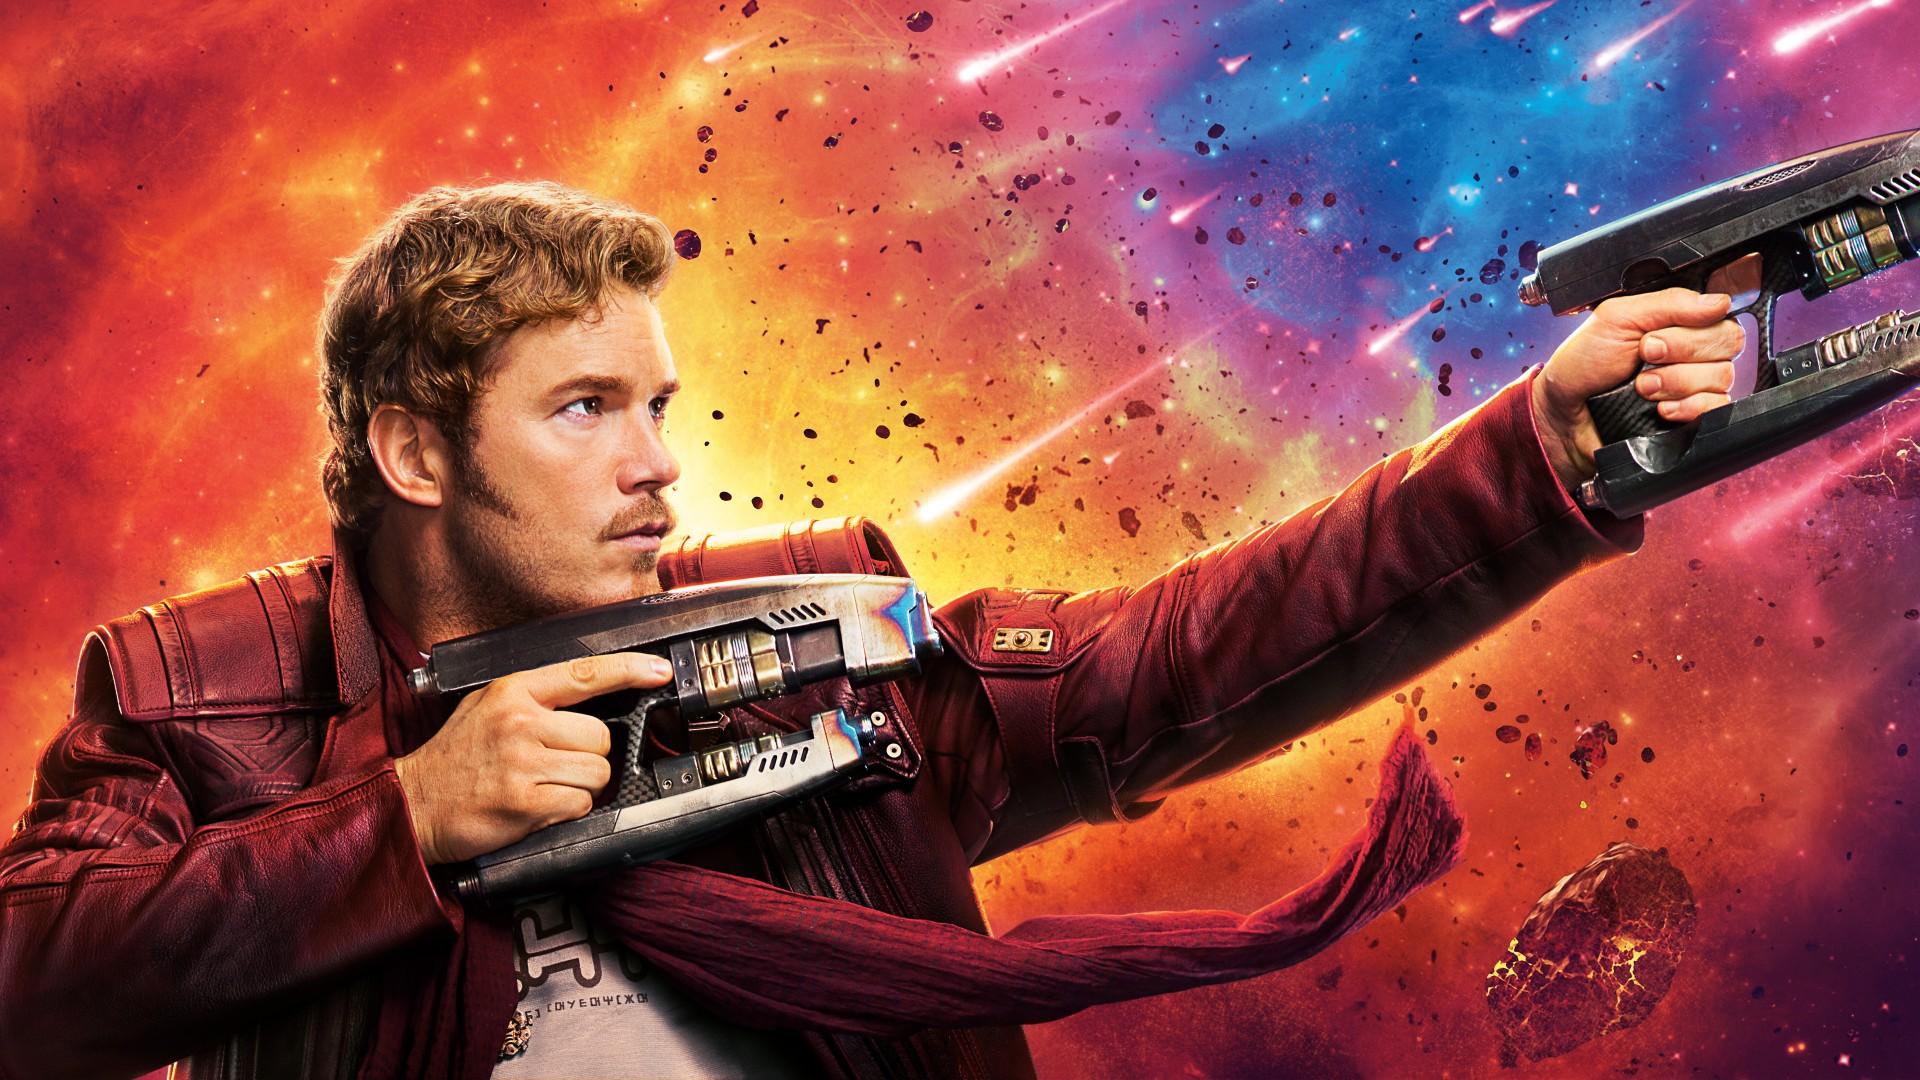 Galaxy Girl Wallpaper Chris Pratt Star Lord Guardians Of The Galaxy Vol 2 4k 8k